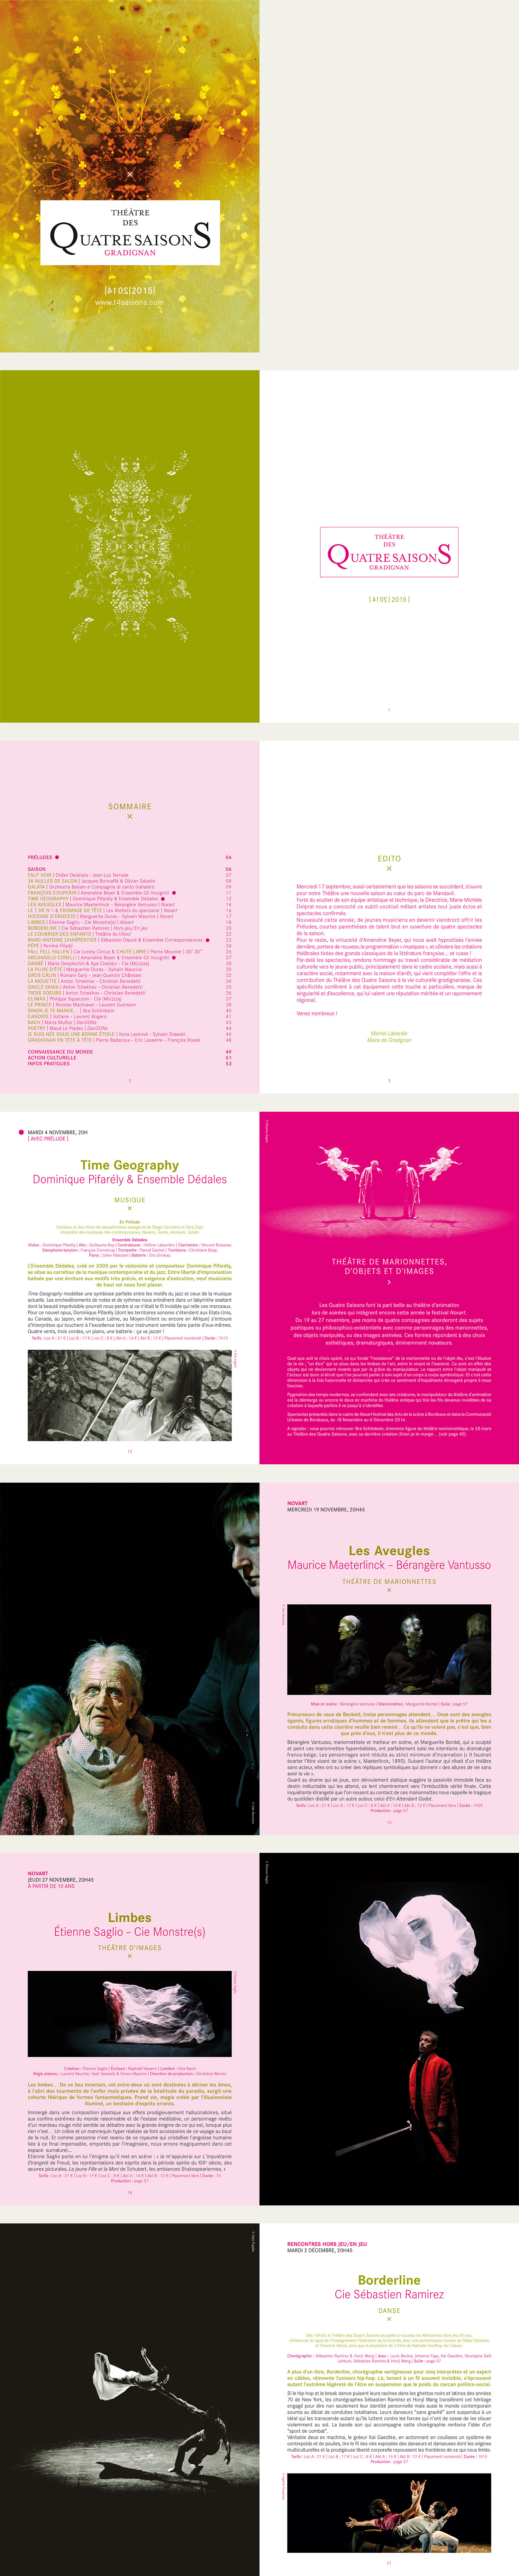 MrThornill-design-theatre-quatre-saisons-programme-2014